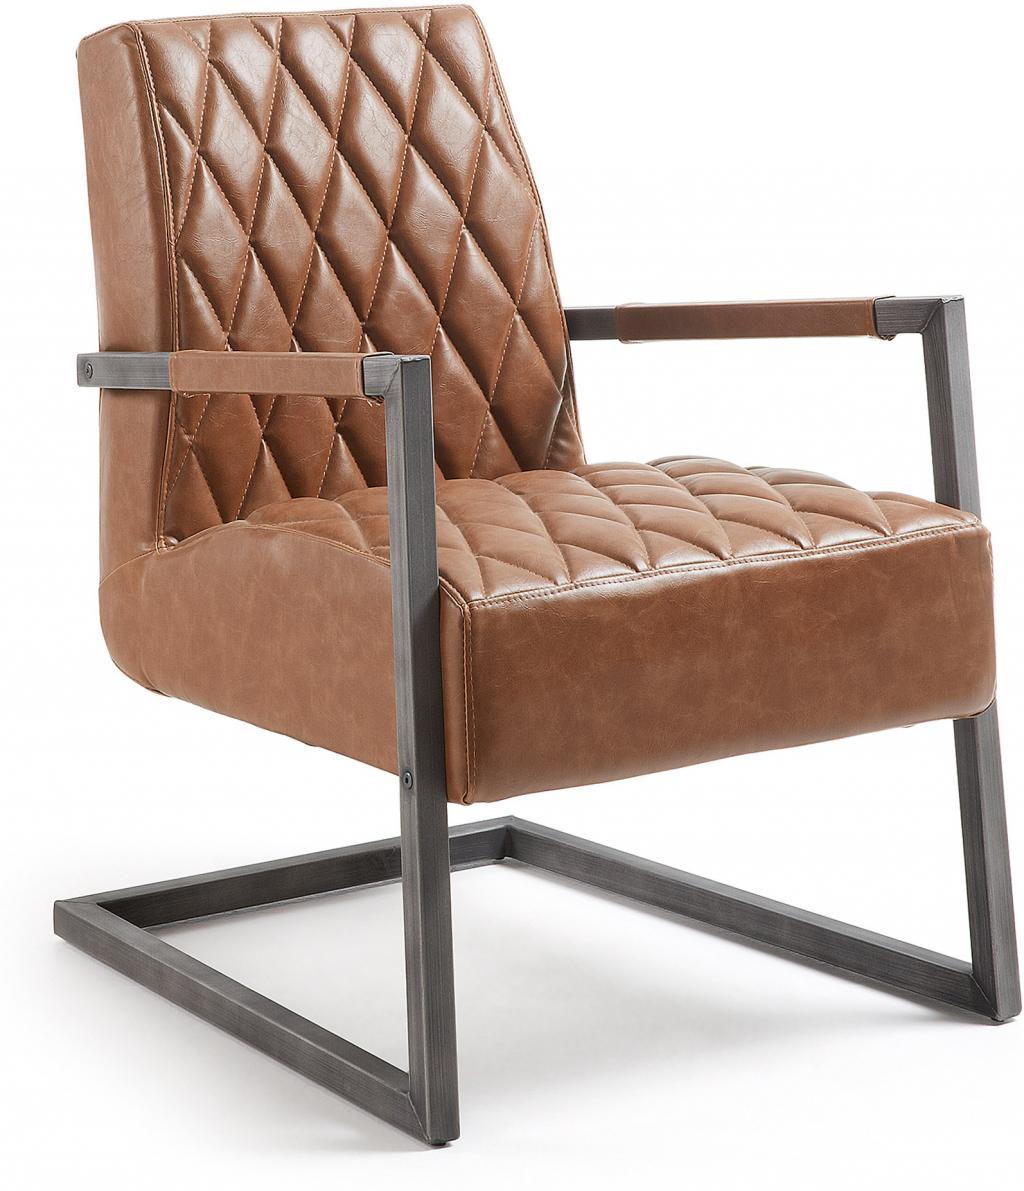 sessel trail cognac braun pu leder metall la forma kaufen wohn und. Black Bedroom Furniture Sets. Home Design Ideas